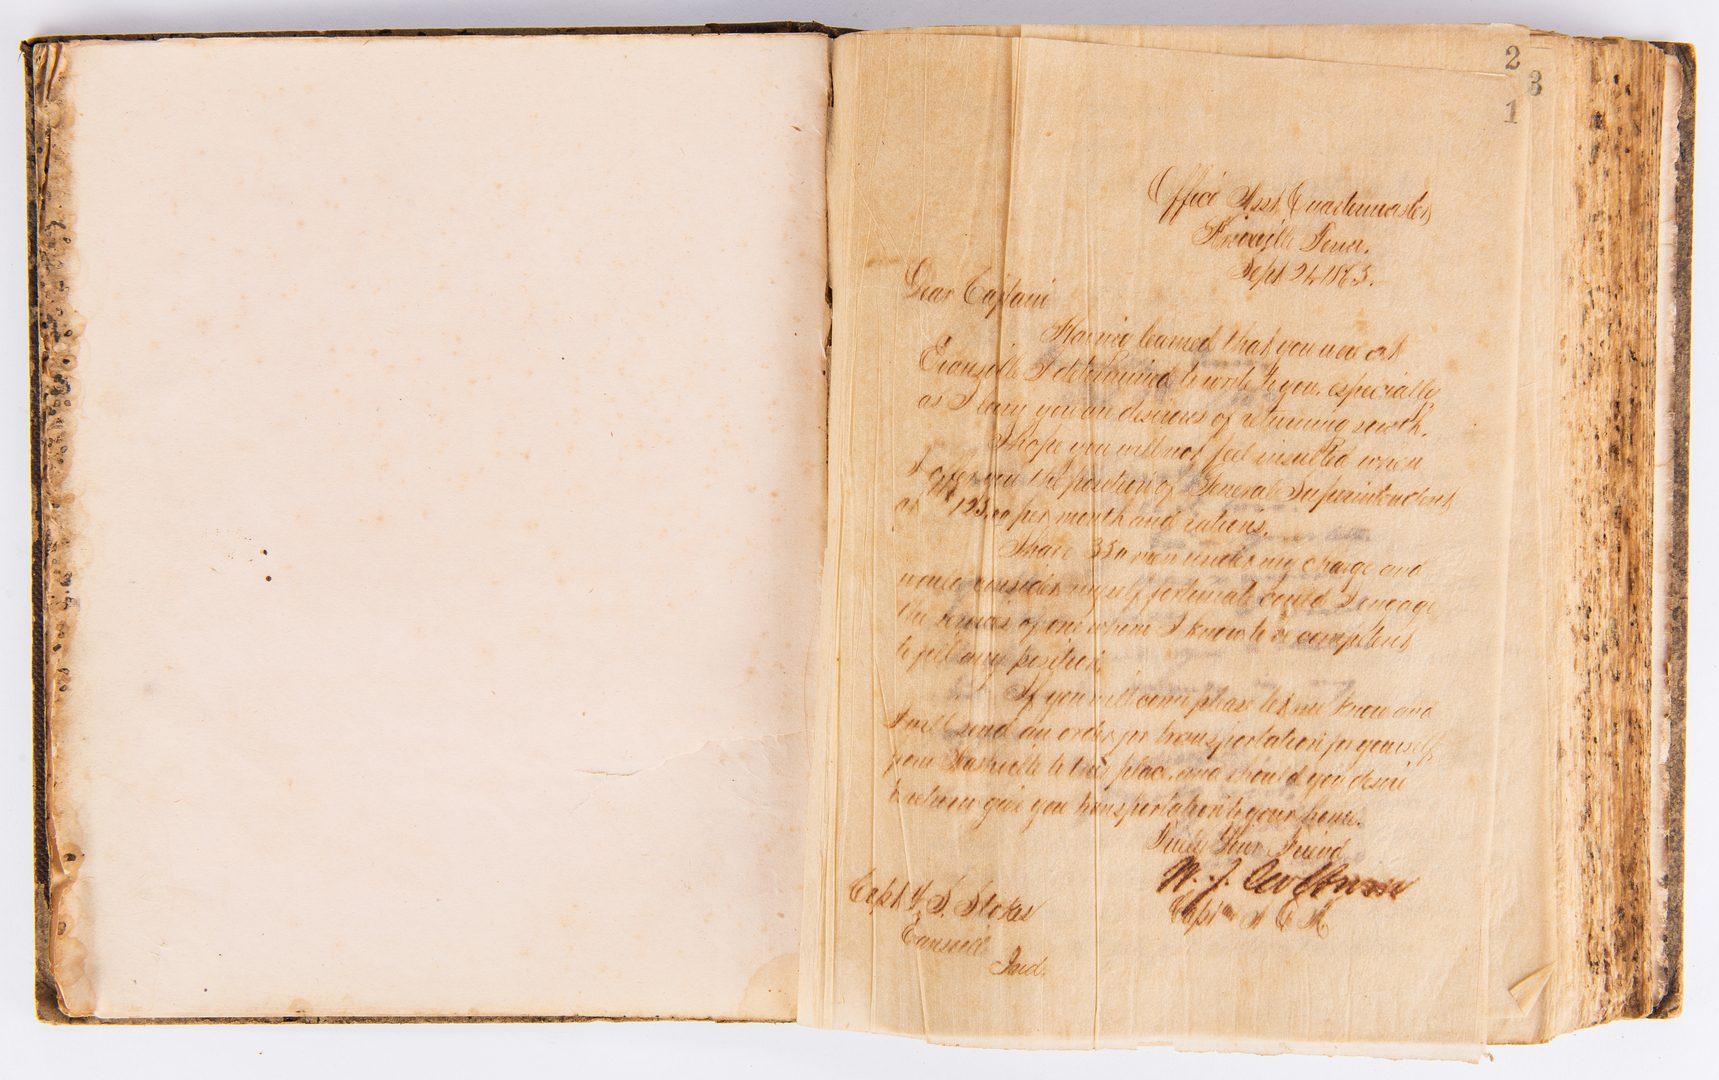 Lot 538: Post Civil War Asst. Quartermaster Copybook, Captain W. J. Colburn, Knoxville